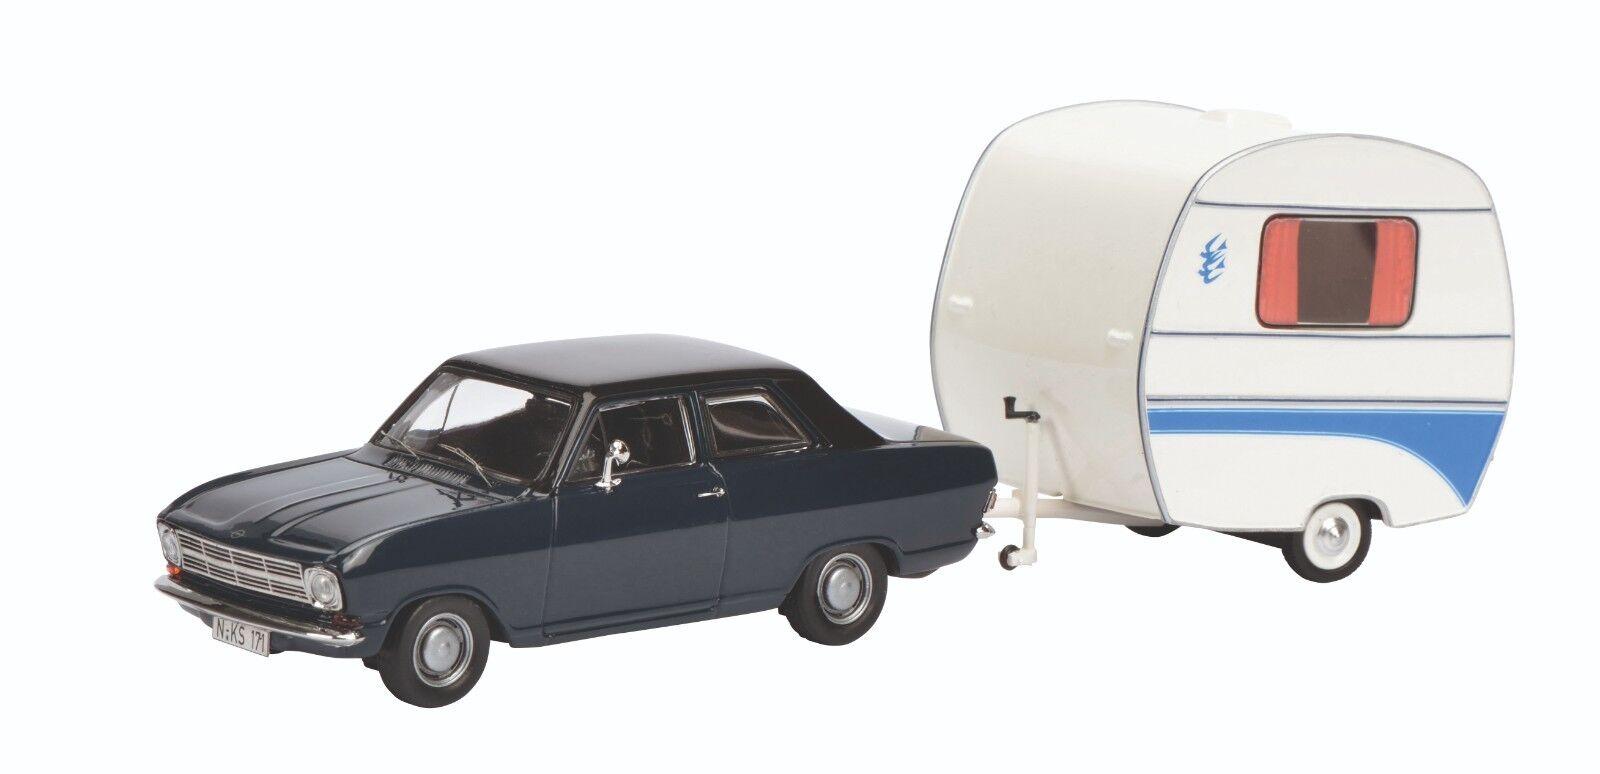 Schuco 450294700 - Opel Kadett B with Caravan Kancherla Swallow's Nest -